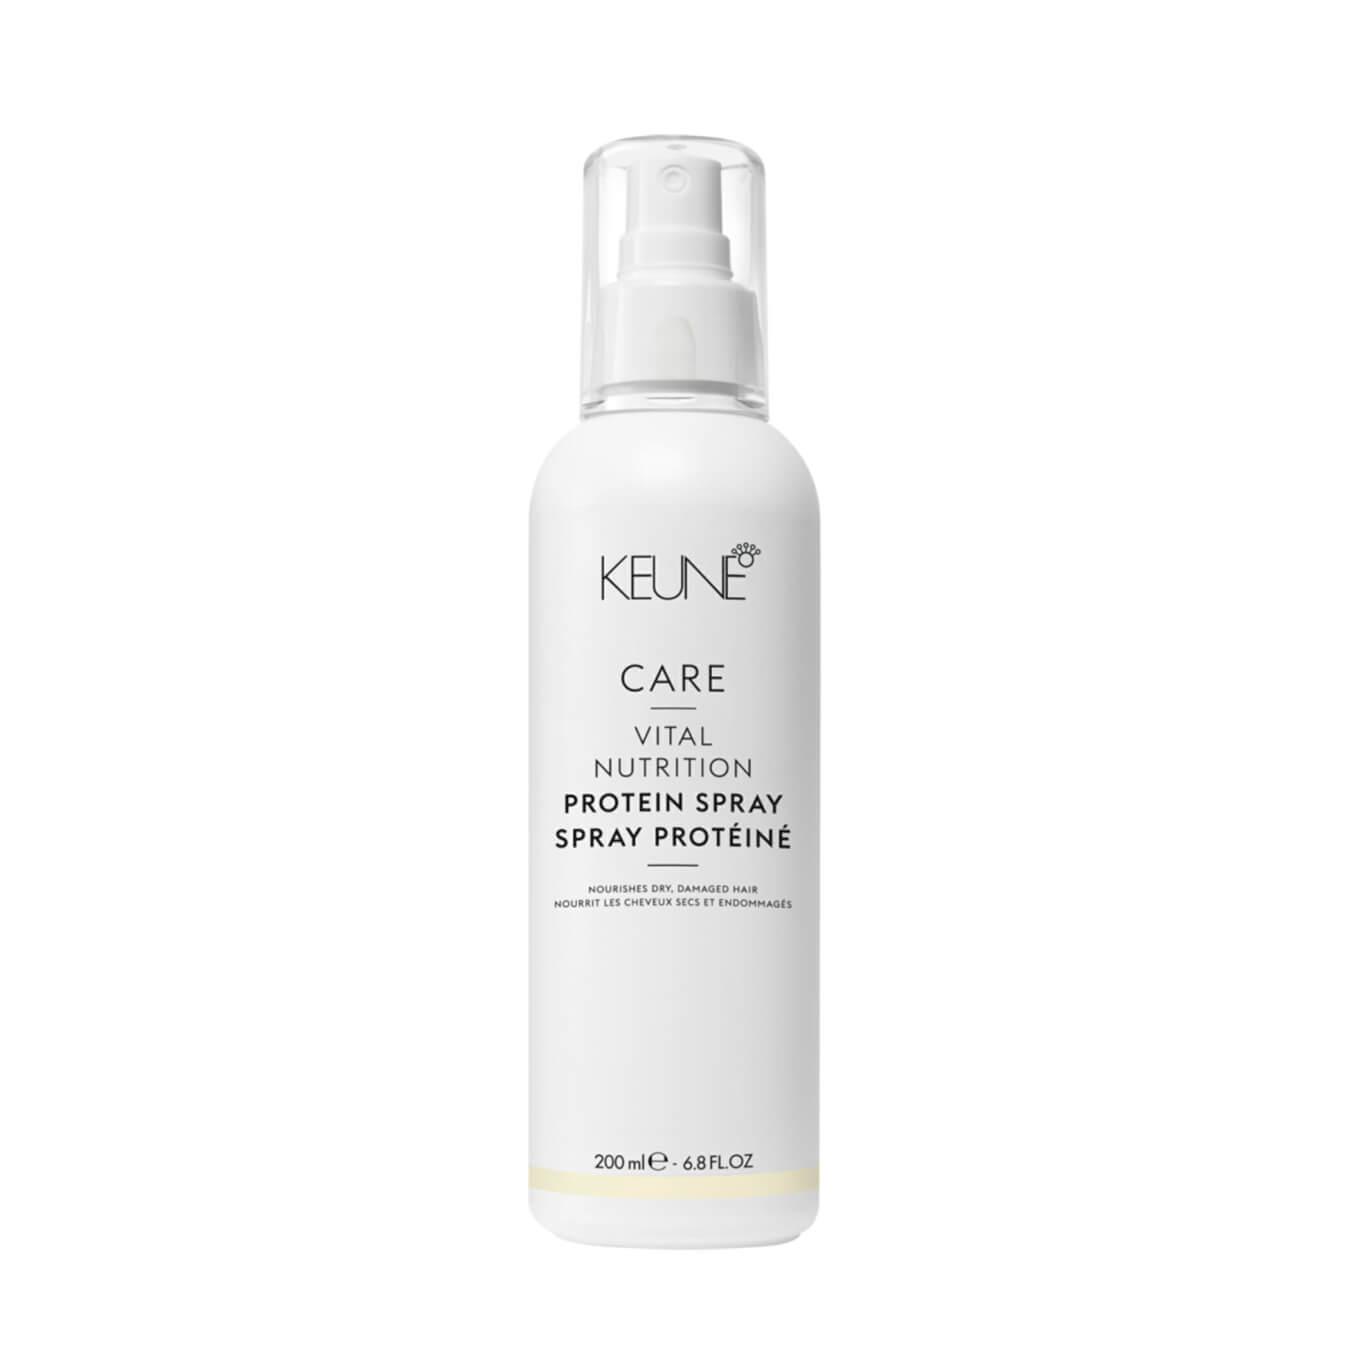 Kauf Keune Care Vital Nutrition Protein Spray 200ml